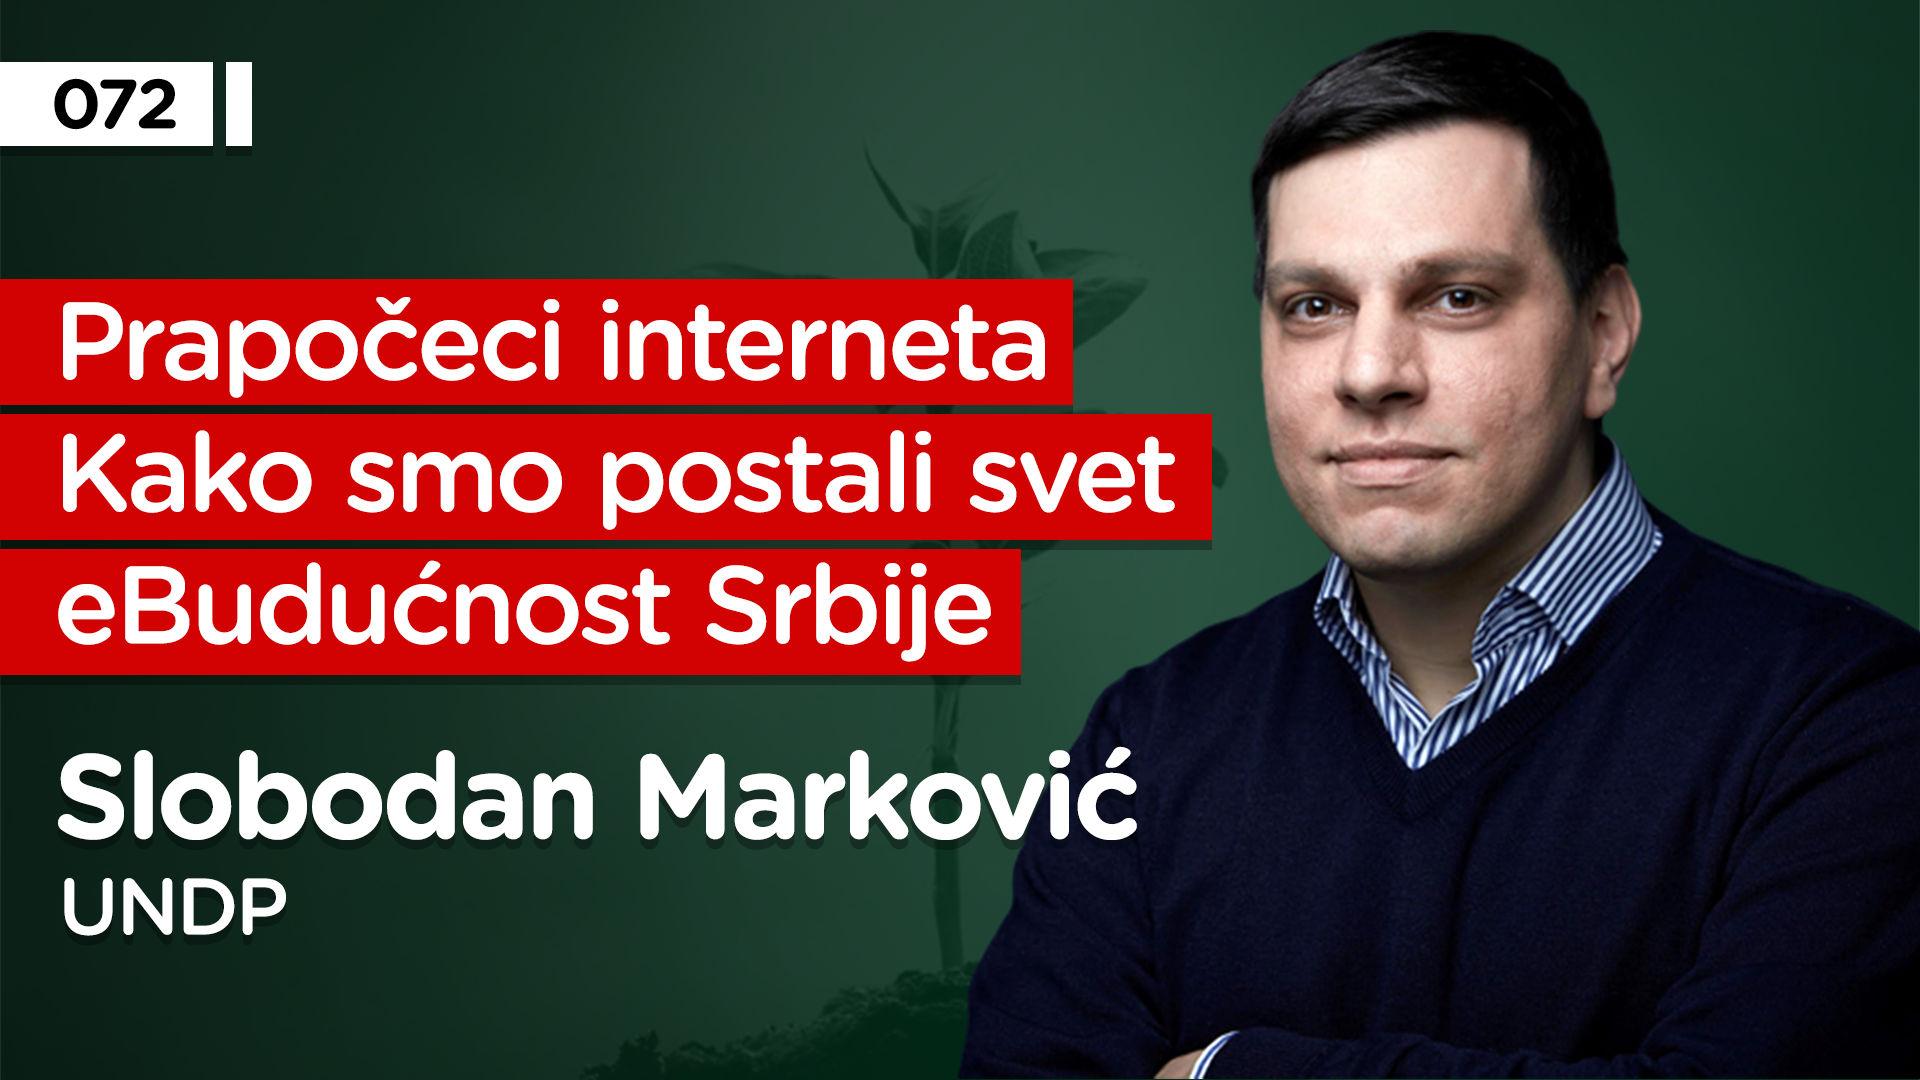 EP072: Slobodan Marković